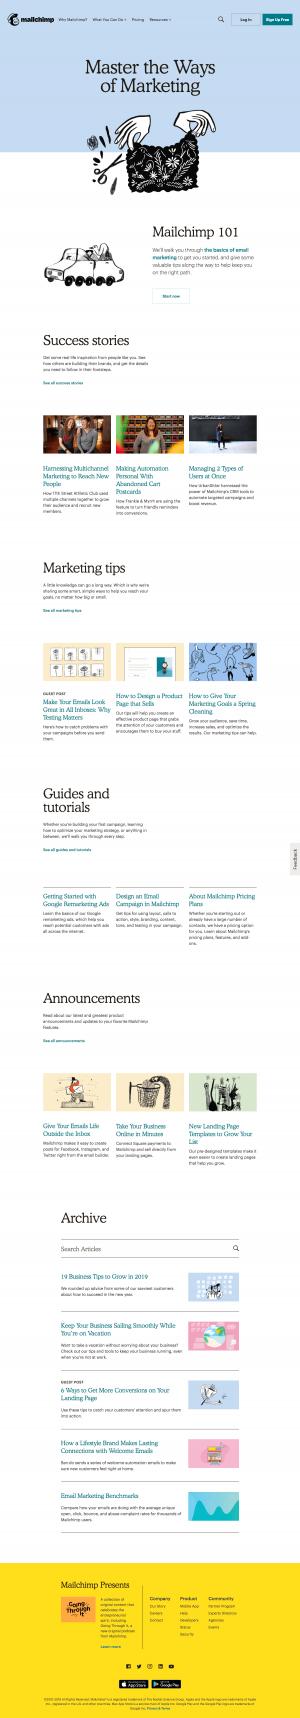 MailChimp - Resources page